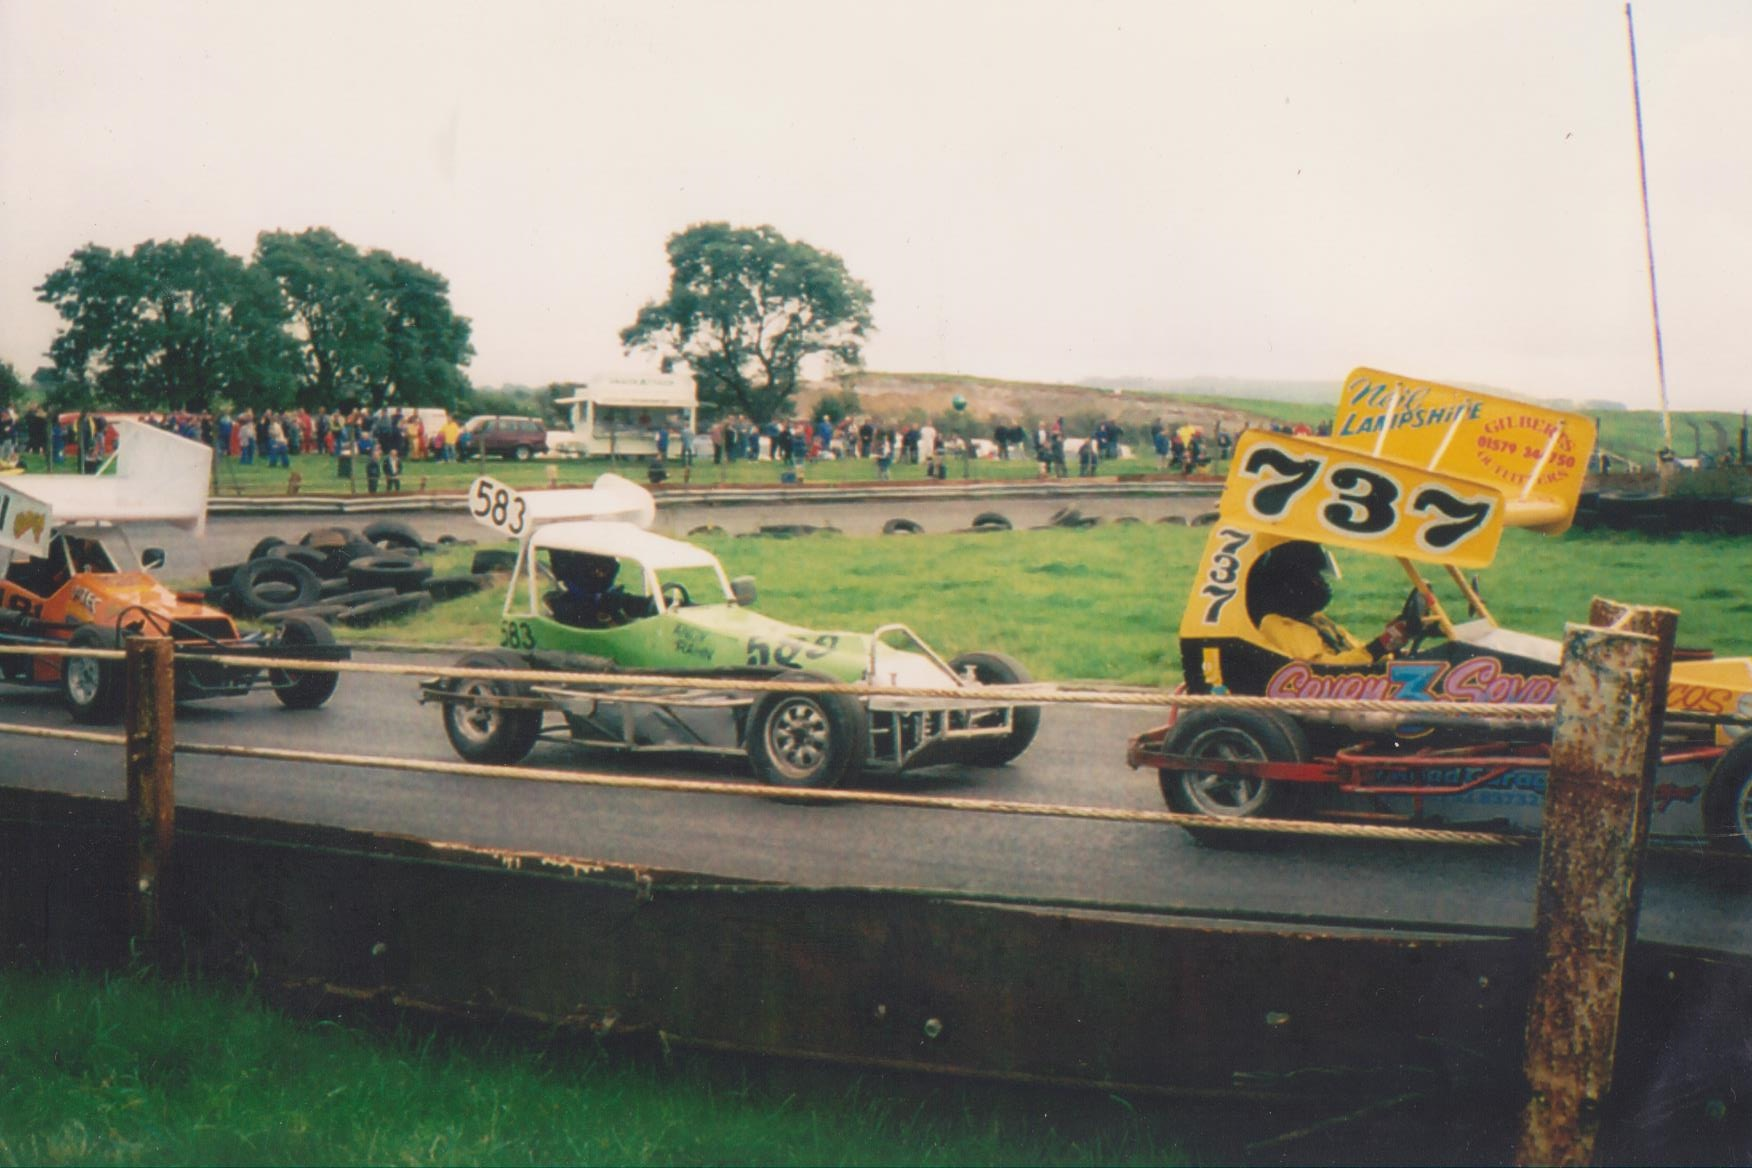 2000 Brisca Fomula 2